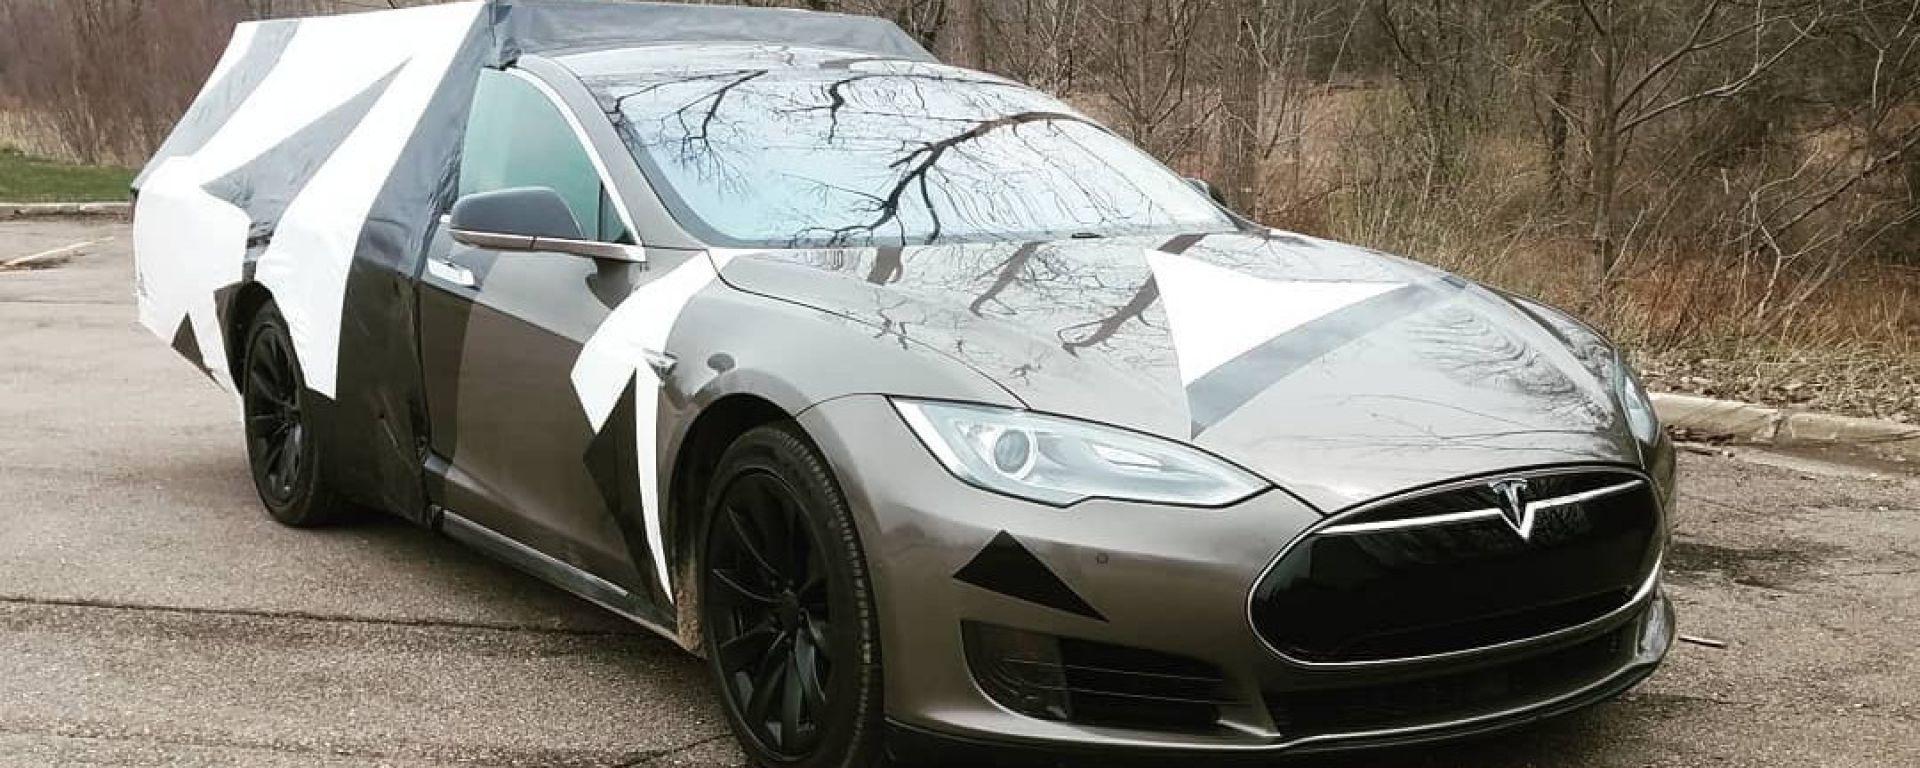 Tesla Roamer, una Tesla Model S da campeggio